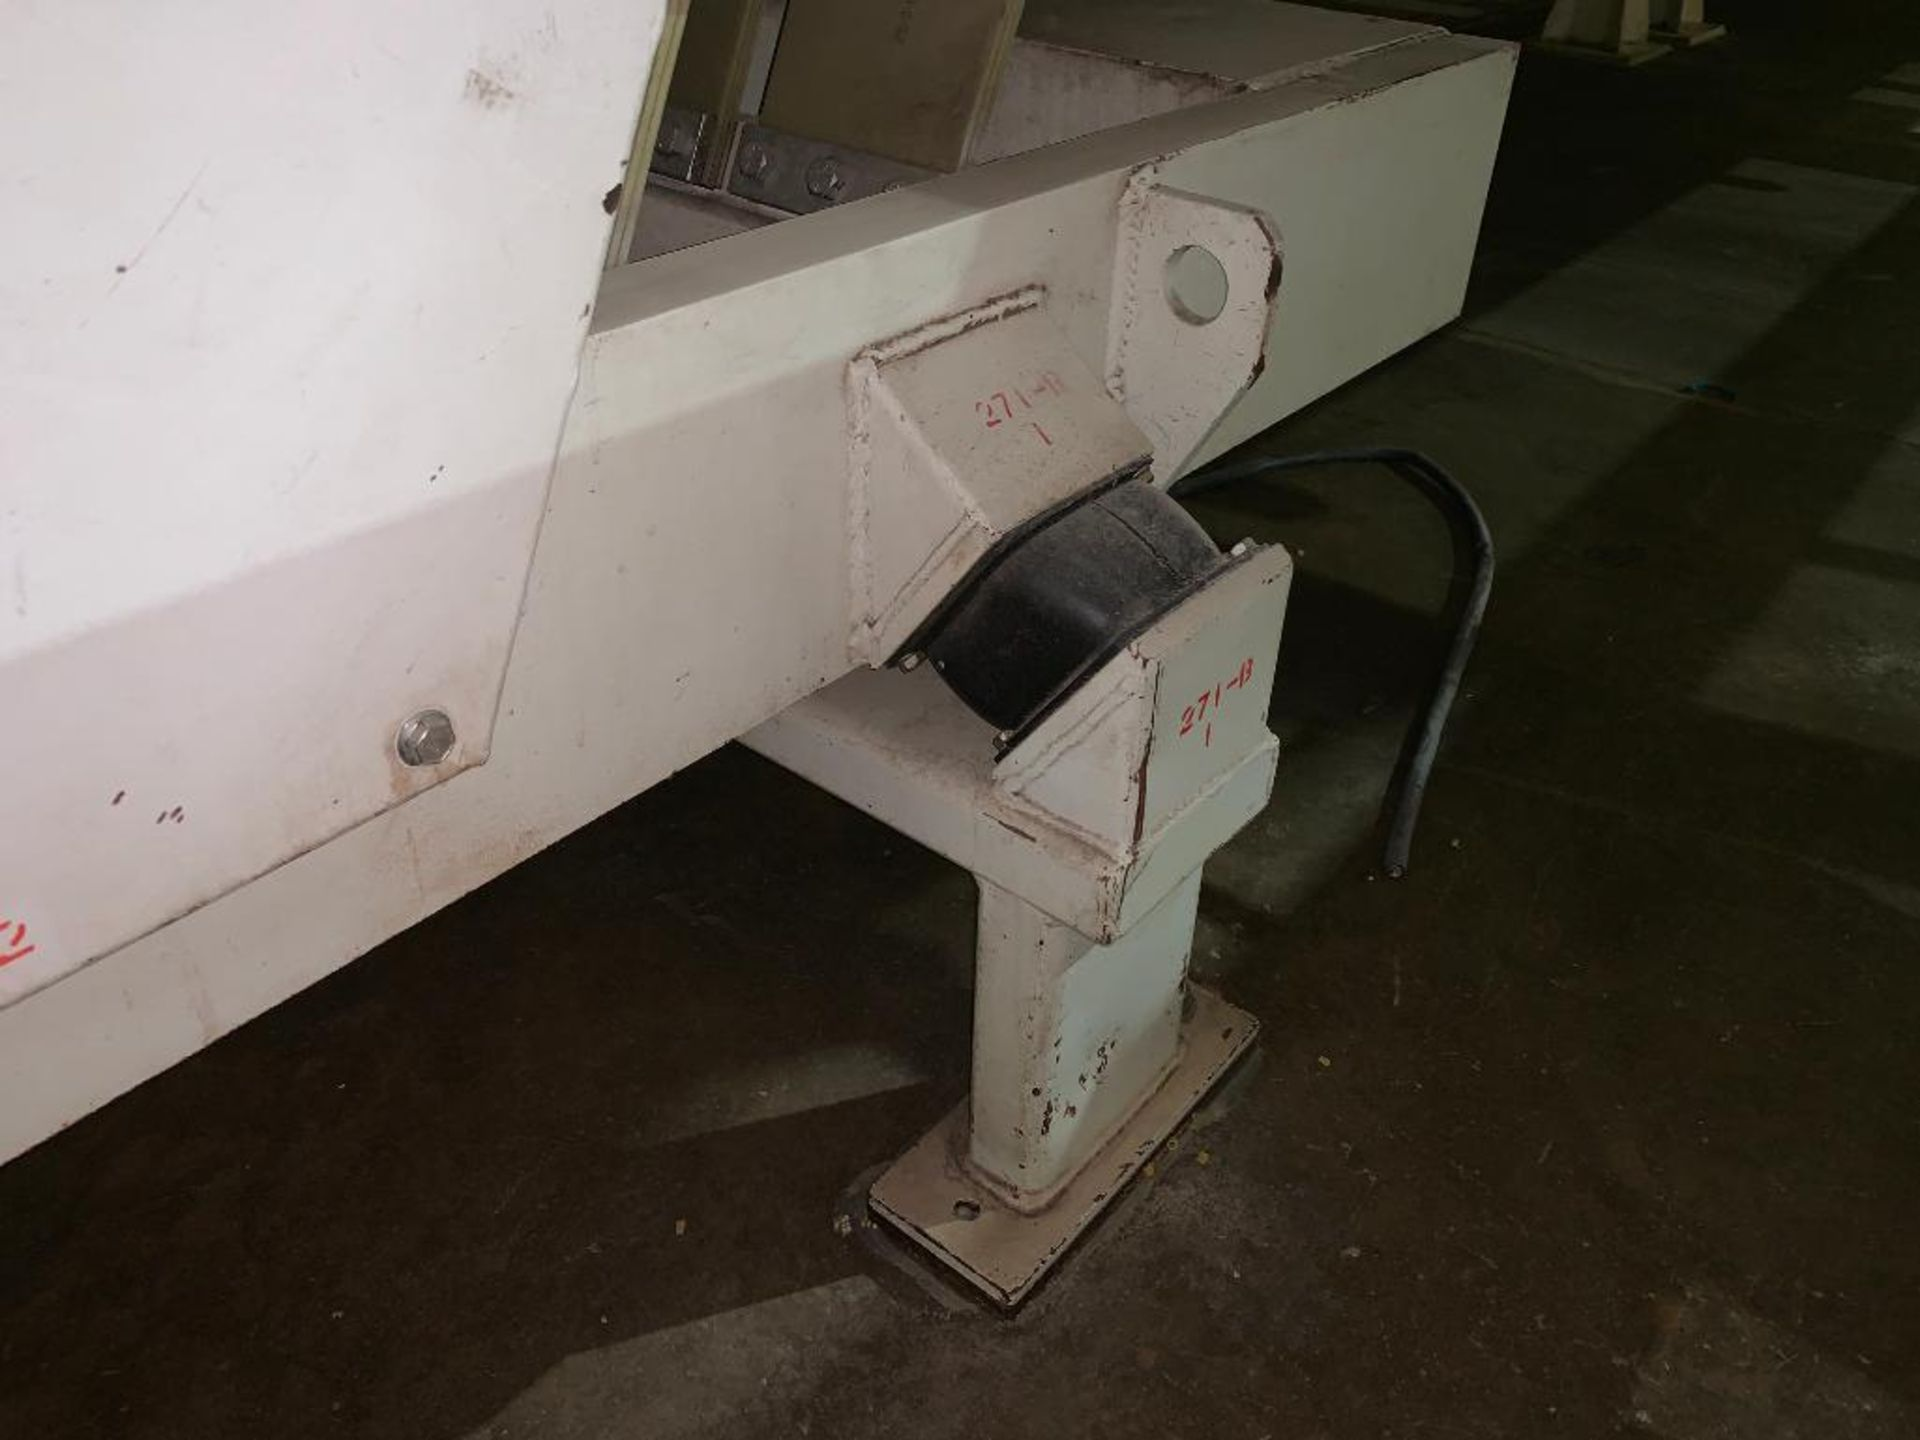 1993 Link-Belt stainless steel vibratory scalping conveyor - Image 7 of 10